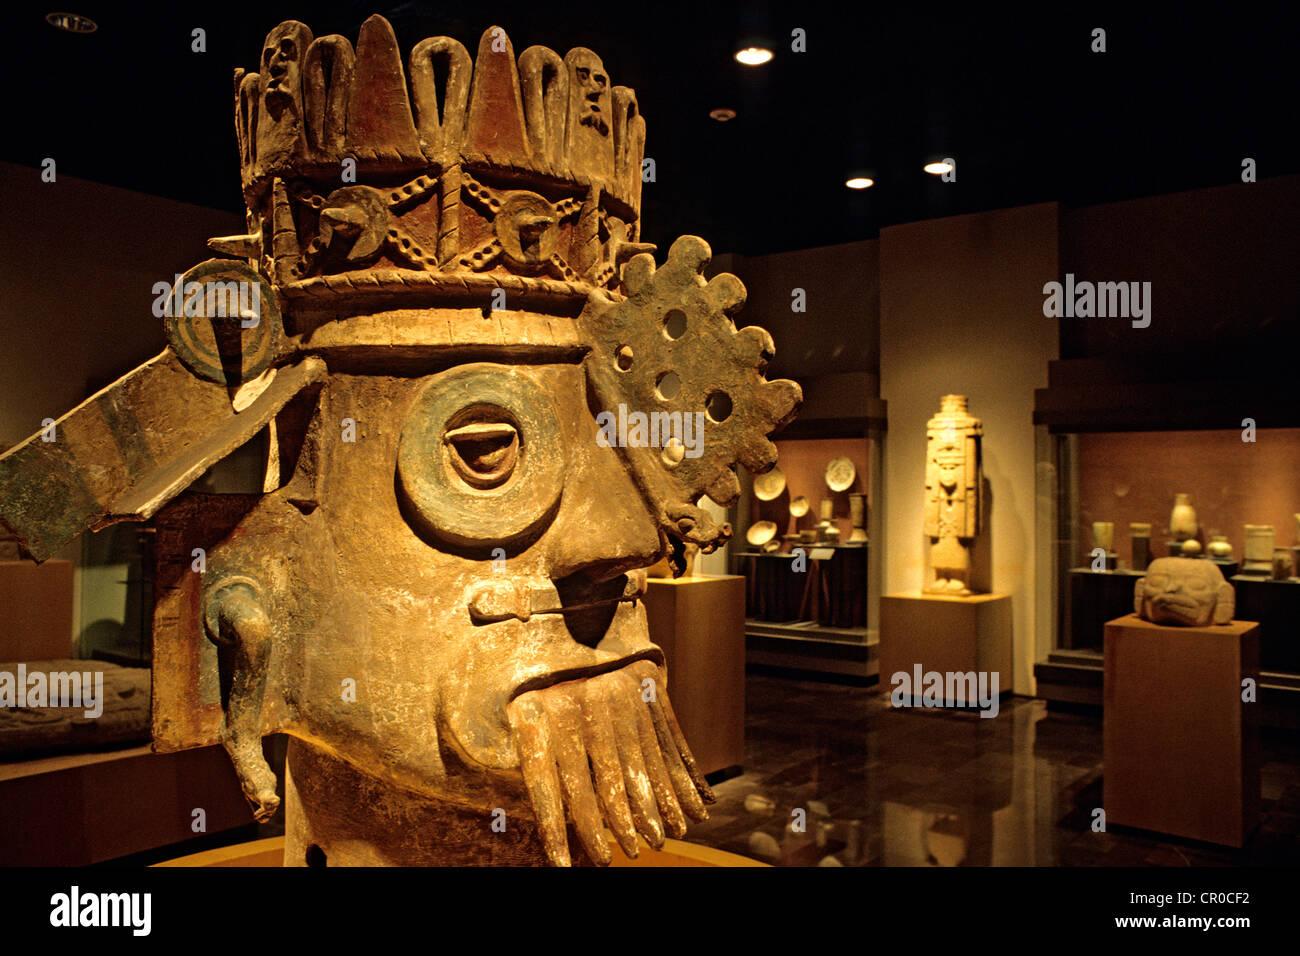 Mexico, Federal District, Mexico City, Museo Nacional de Antropología (MNA, or National Museum of Anthropology), - Stock Image